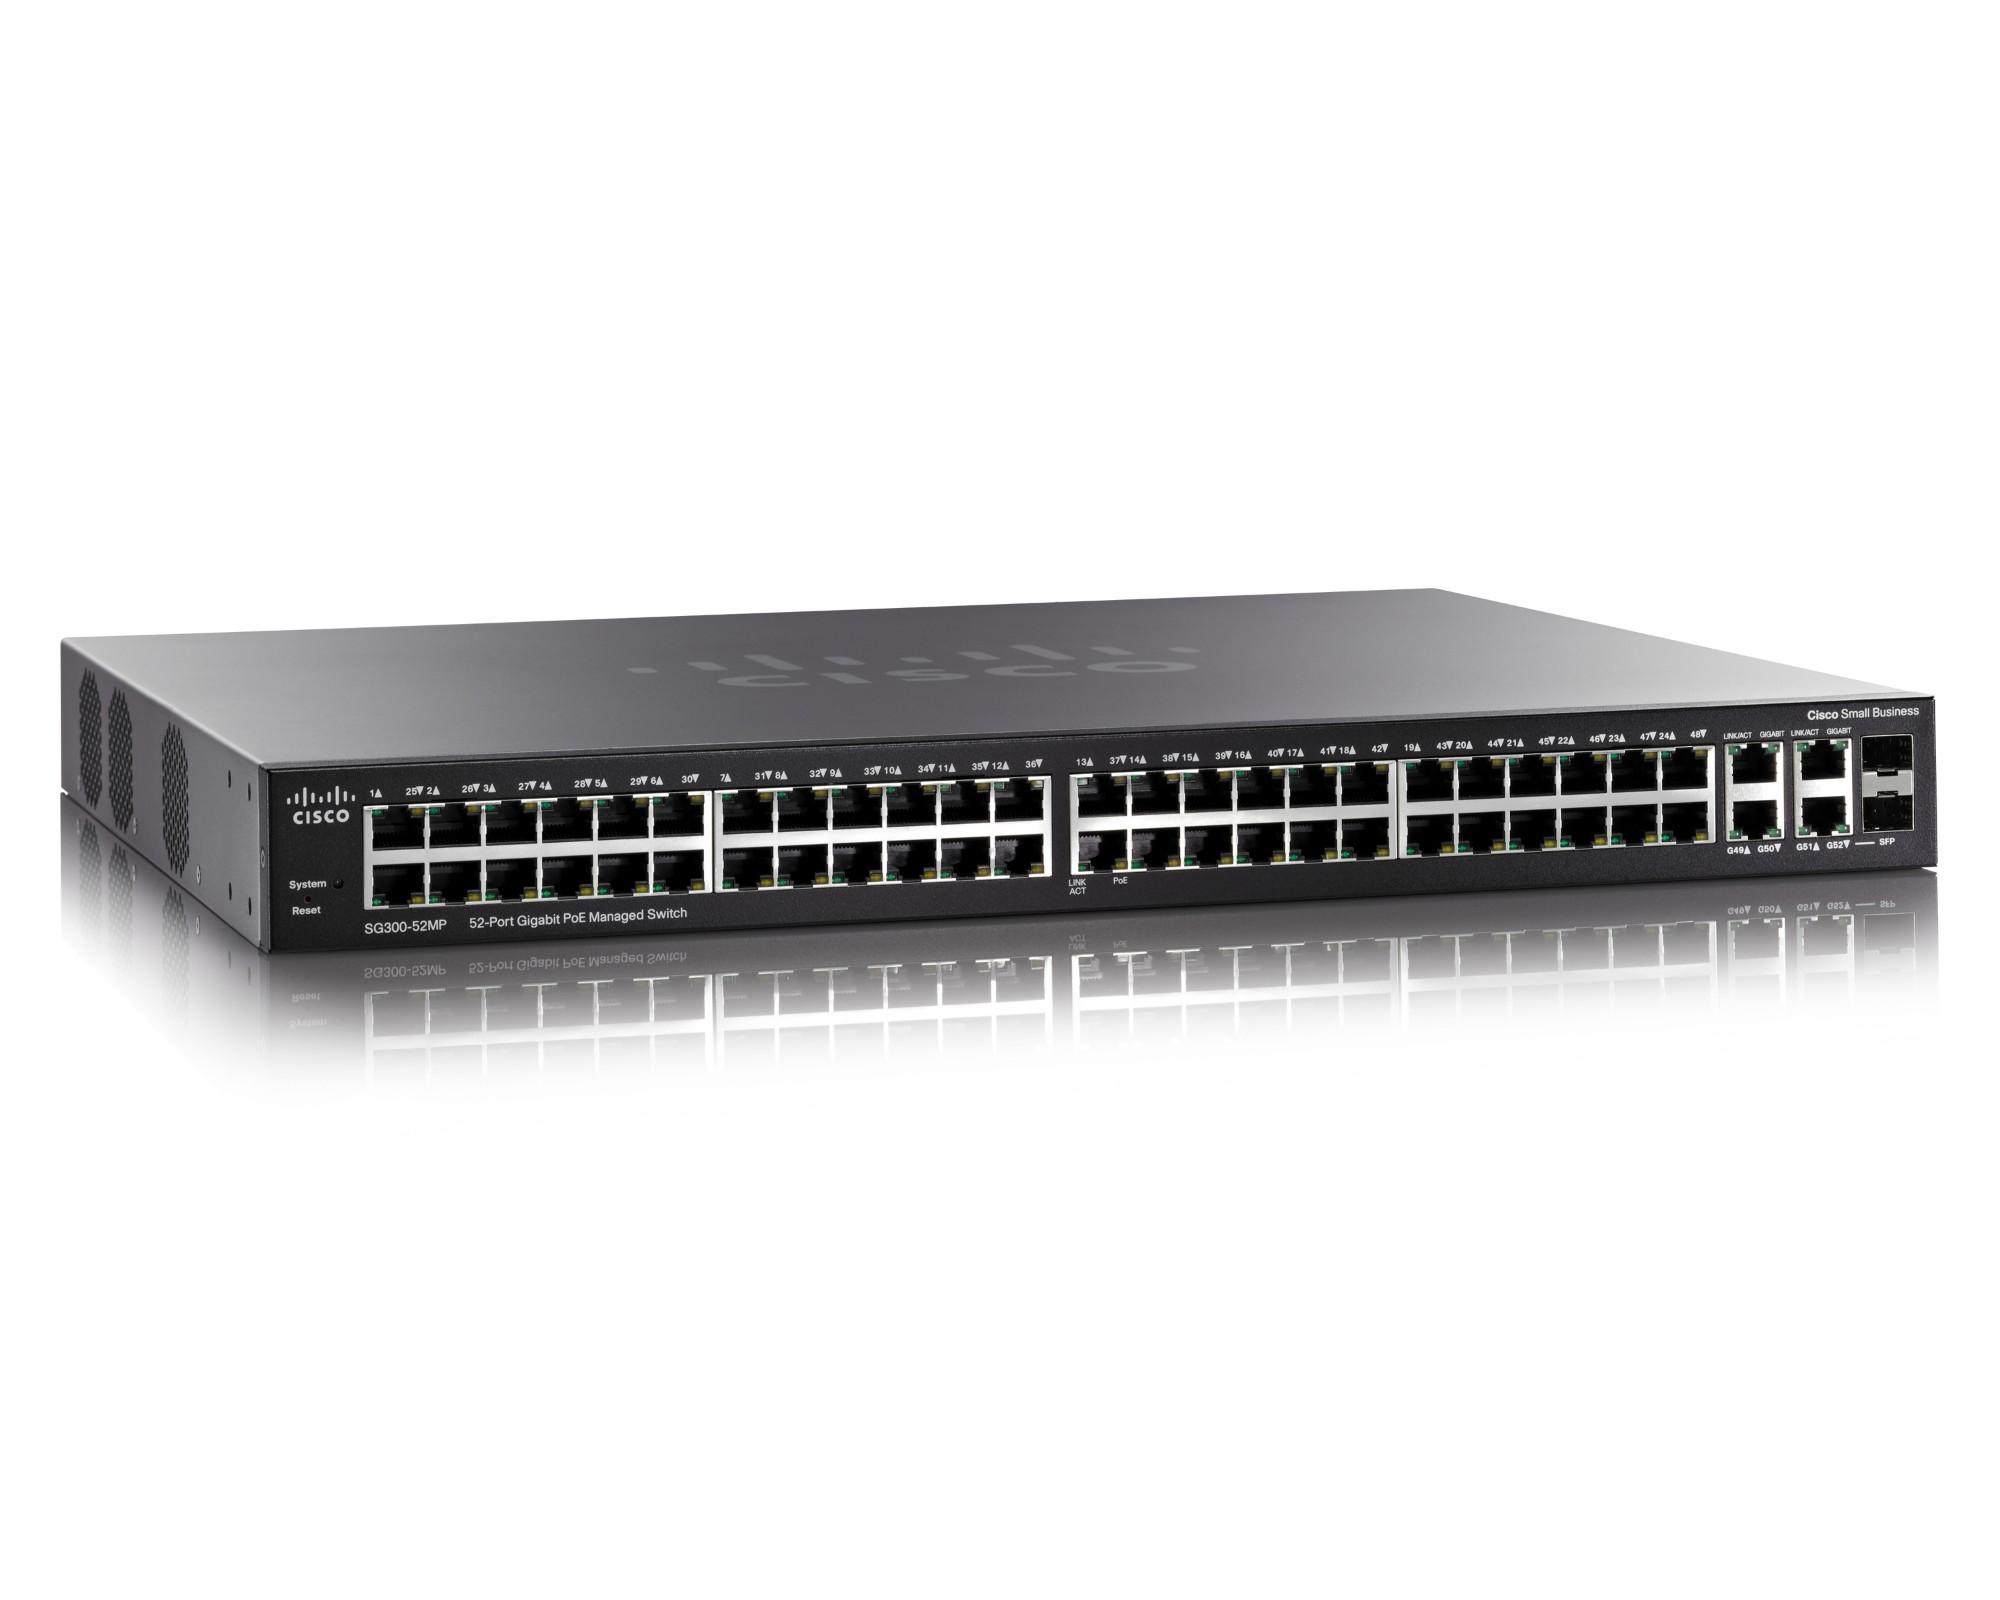 Cisco Small Business SG300-52MP Managed L3 Gigabit Ethernet (10/100/1000) Zwart Power over Ethernet (PoE)